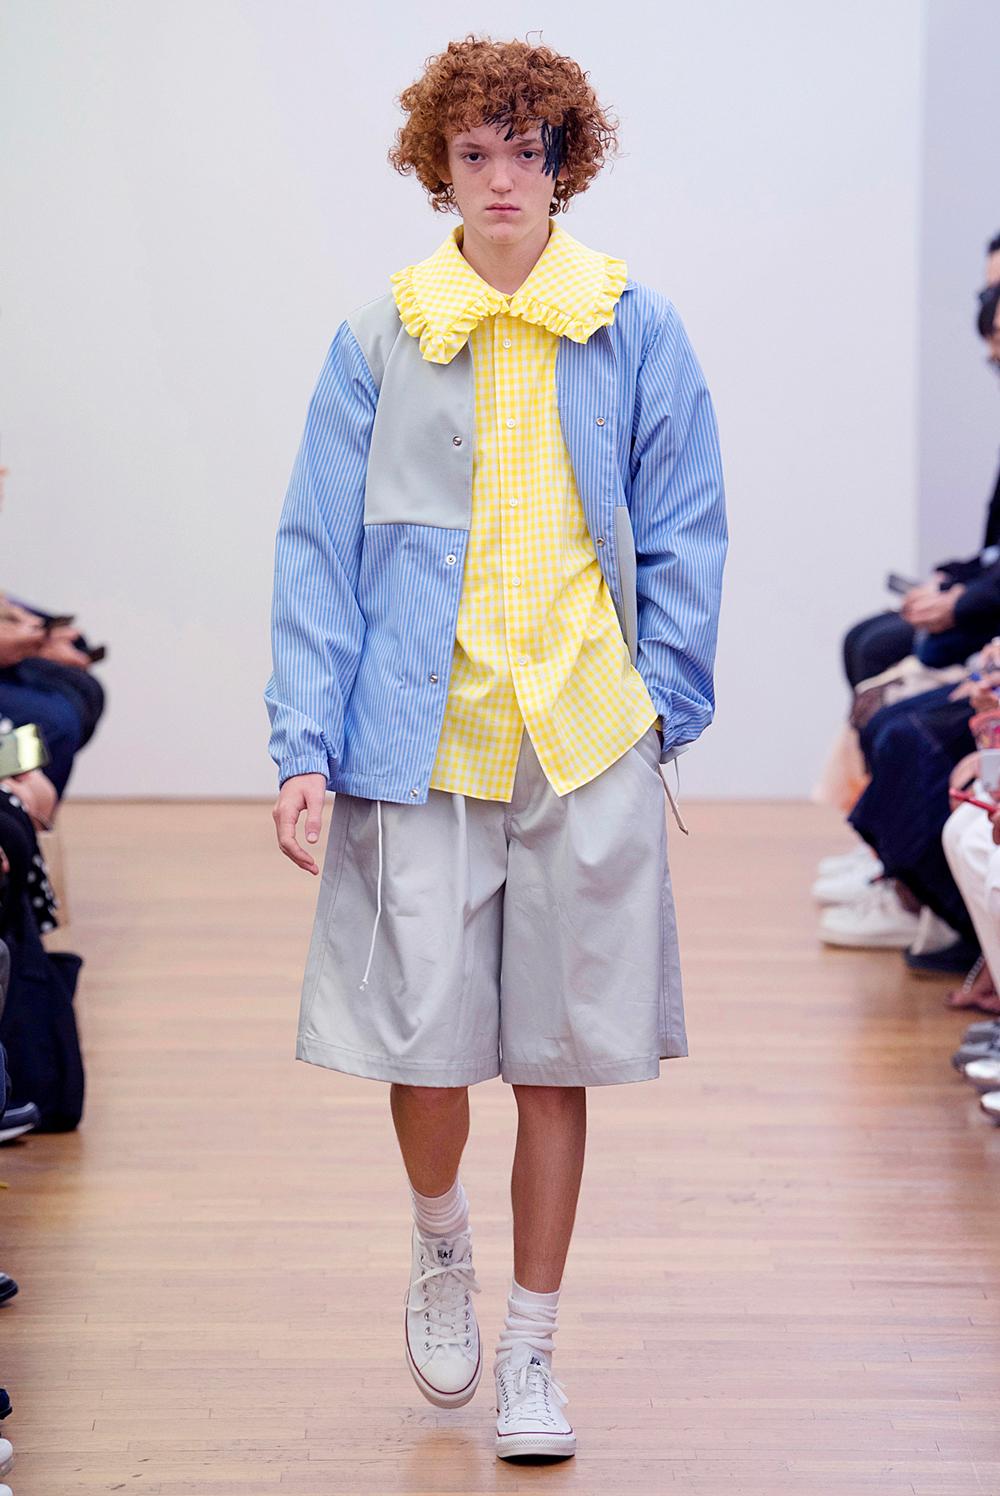 cdg_shirt_boy_1.jpg